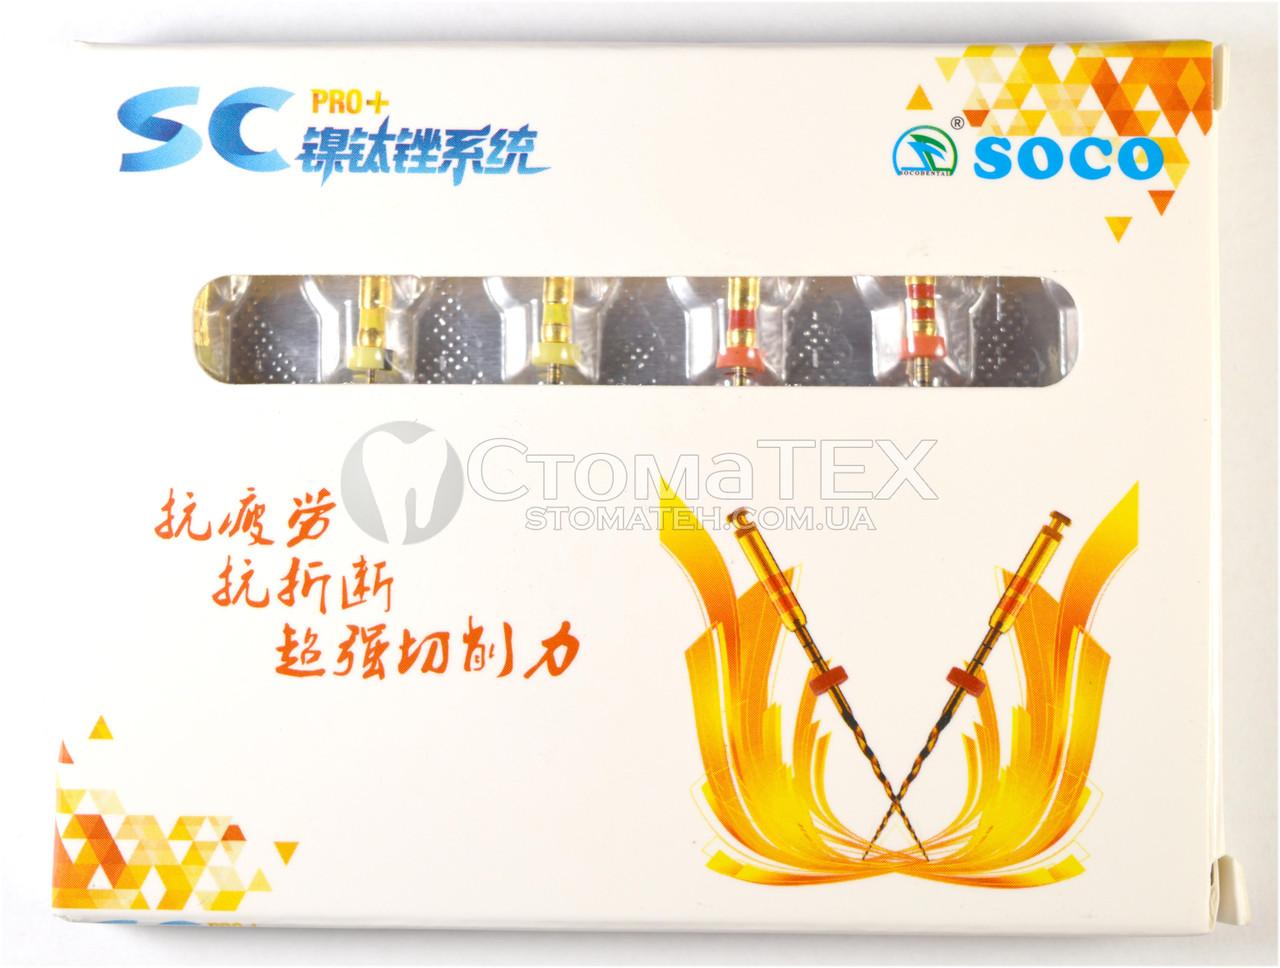 SC-Pro 25мм. 0219  6шт., фото 1